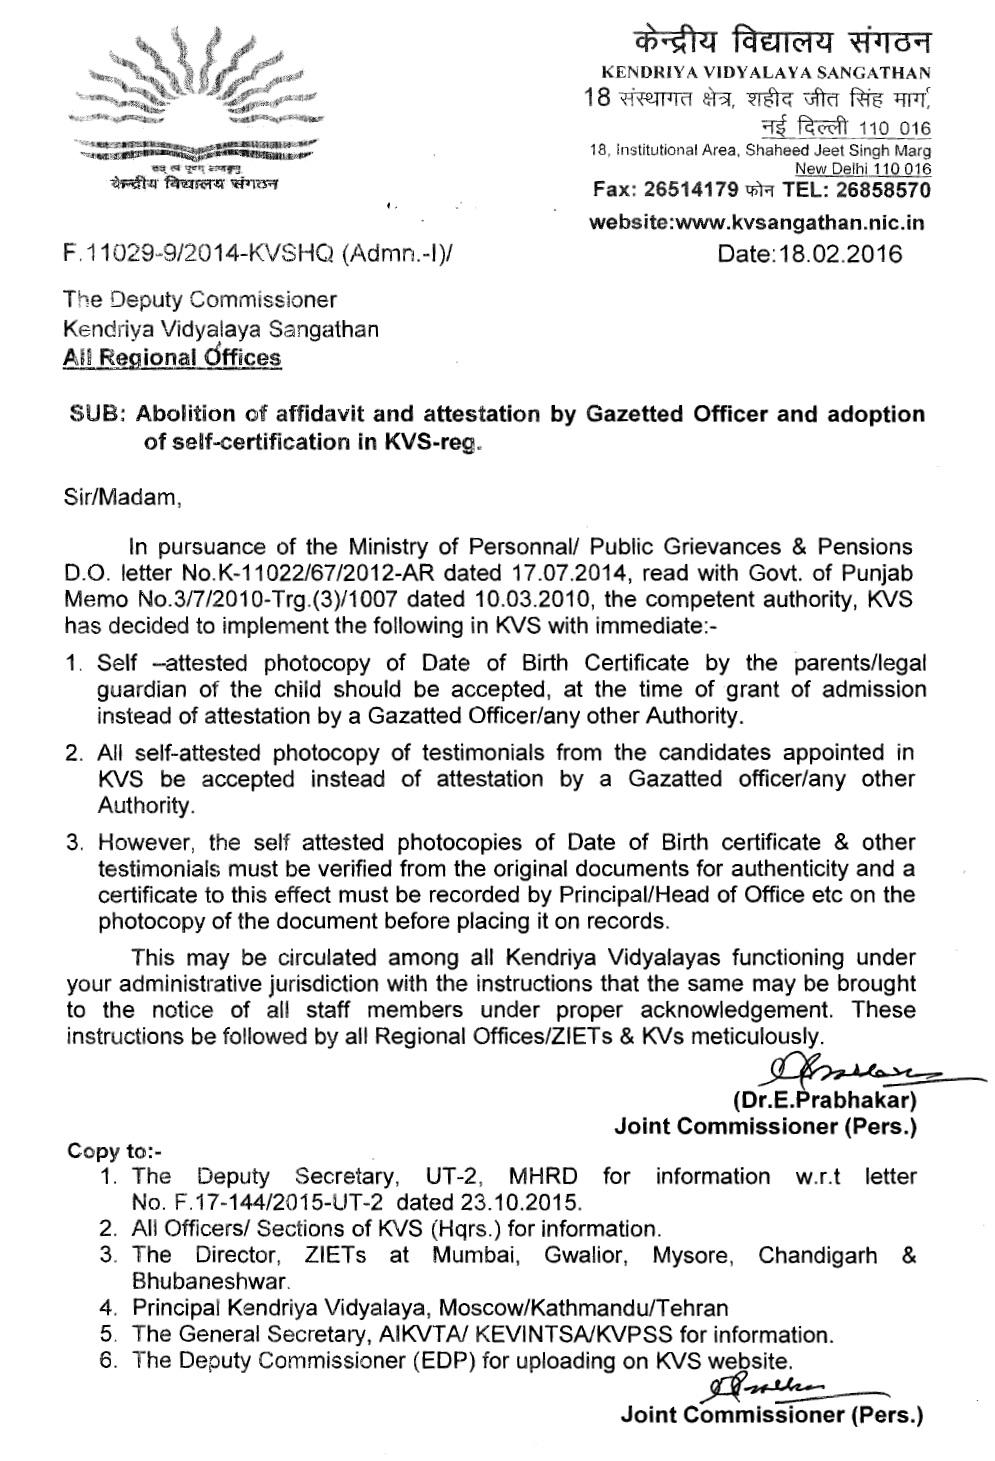 Kvpss Jaipur Region Official Web Portal Abolition Of Affidavit